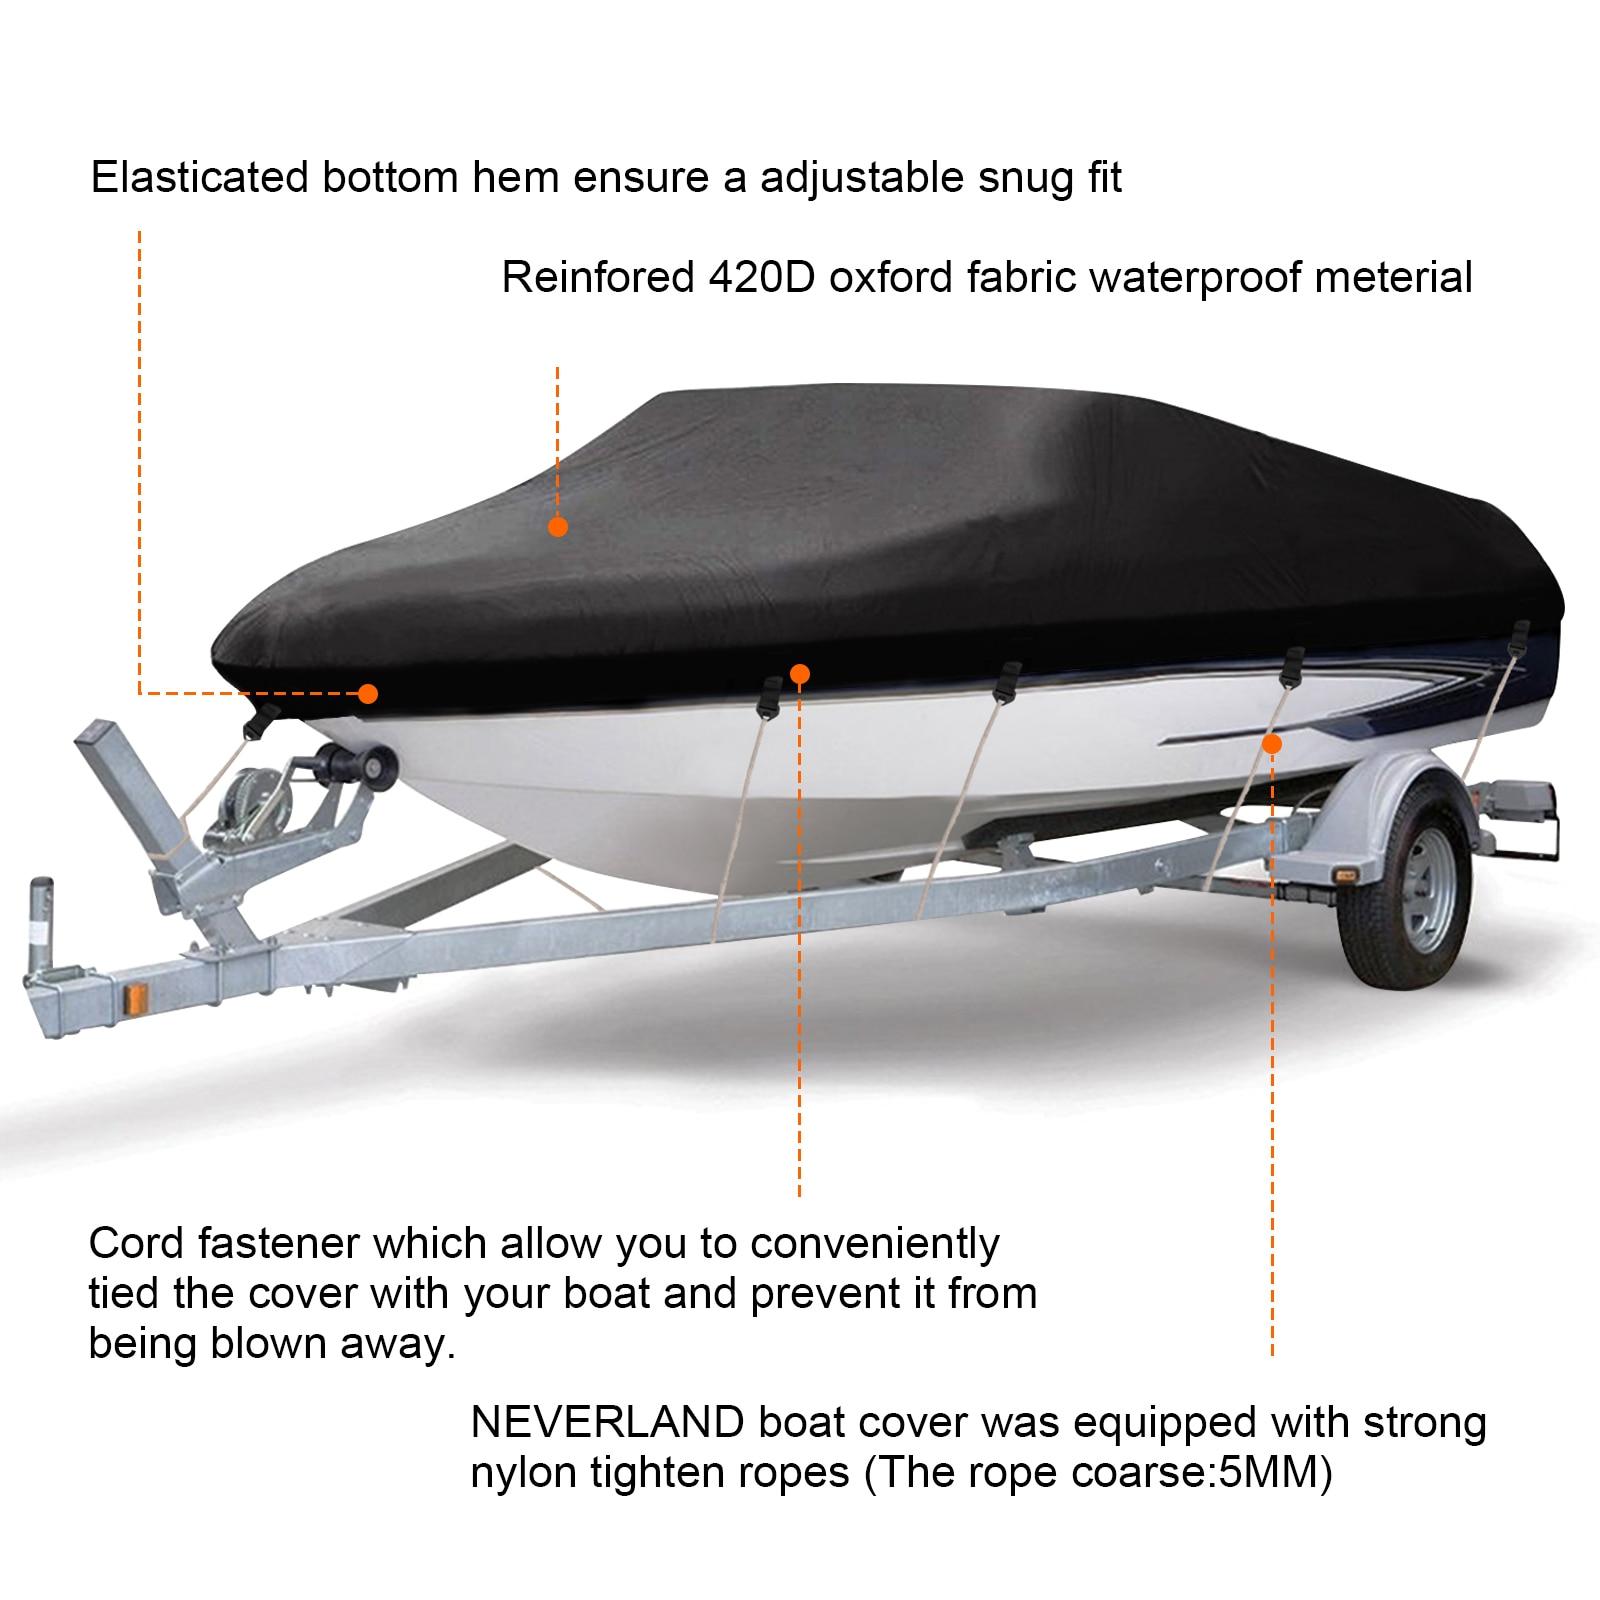 20 21 22ft Trailerable Boat Cover V-hull Fish Ski Heavy Duty 210D Waterproof